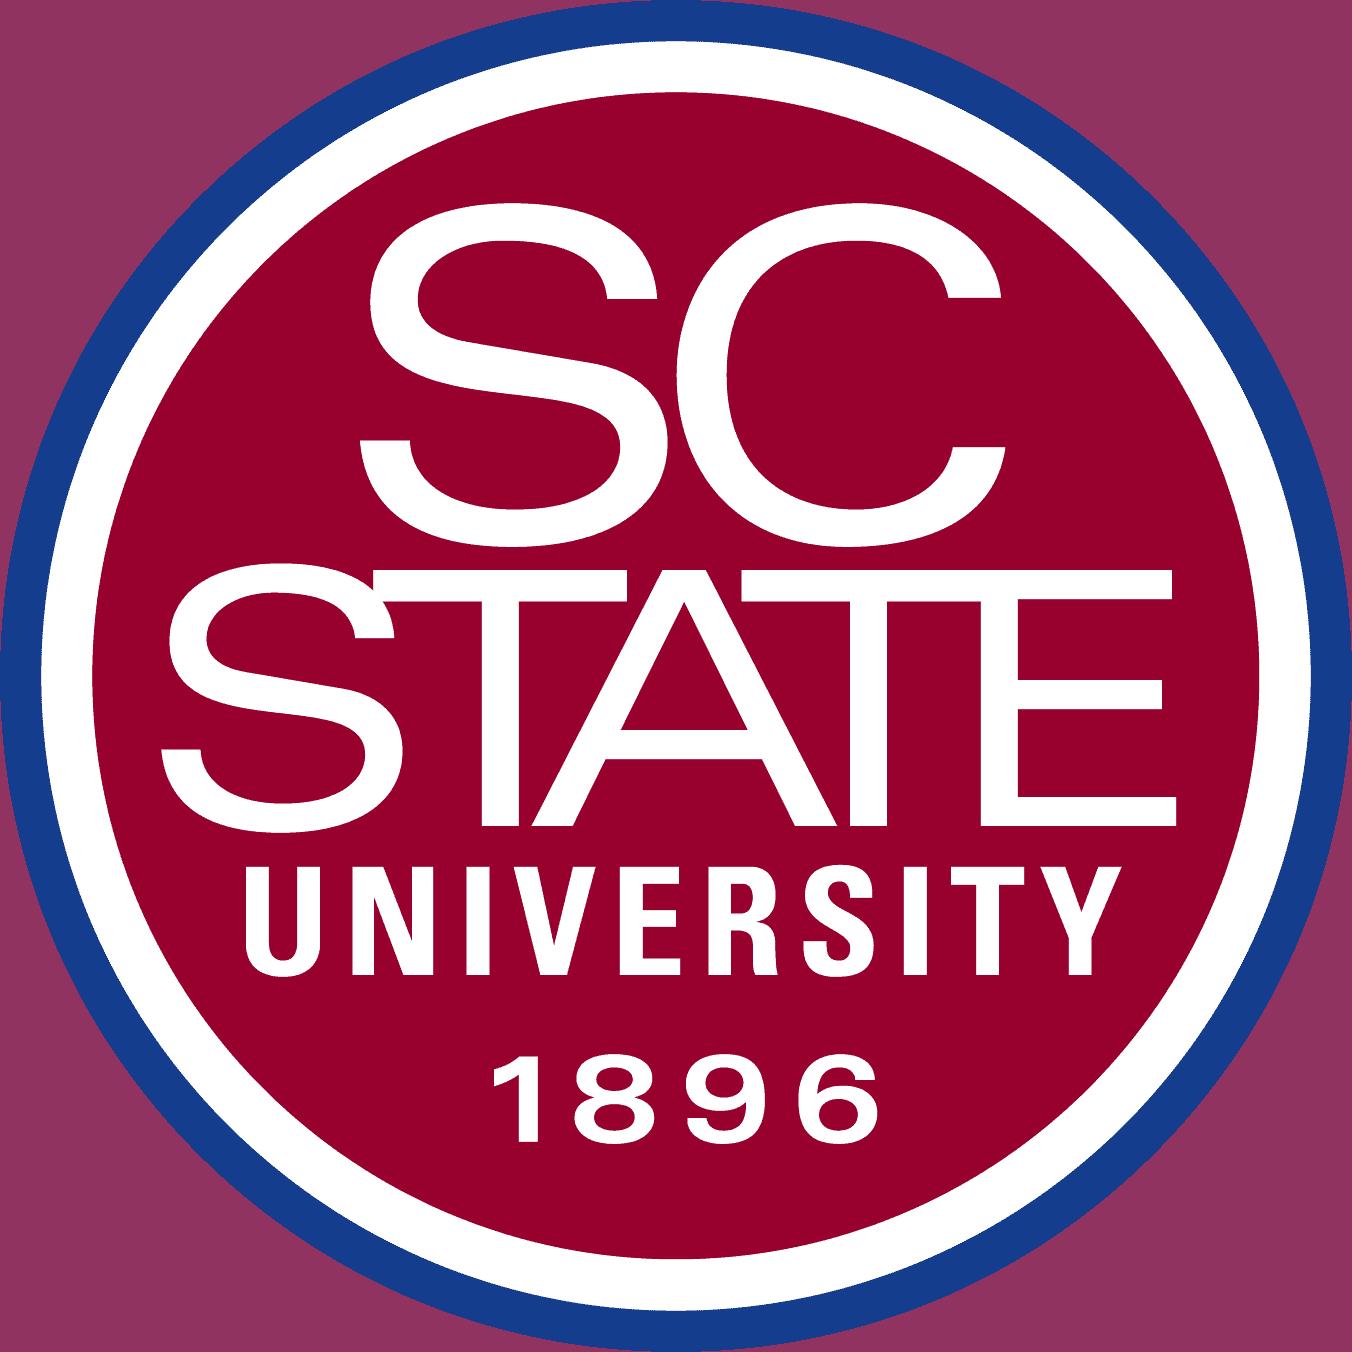 South Carolina State University Logo (SCSU   SC State) png